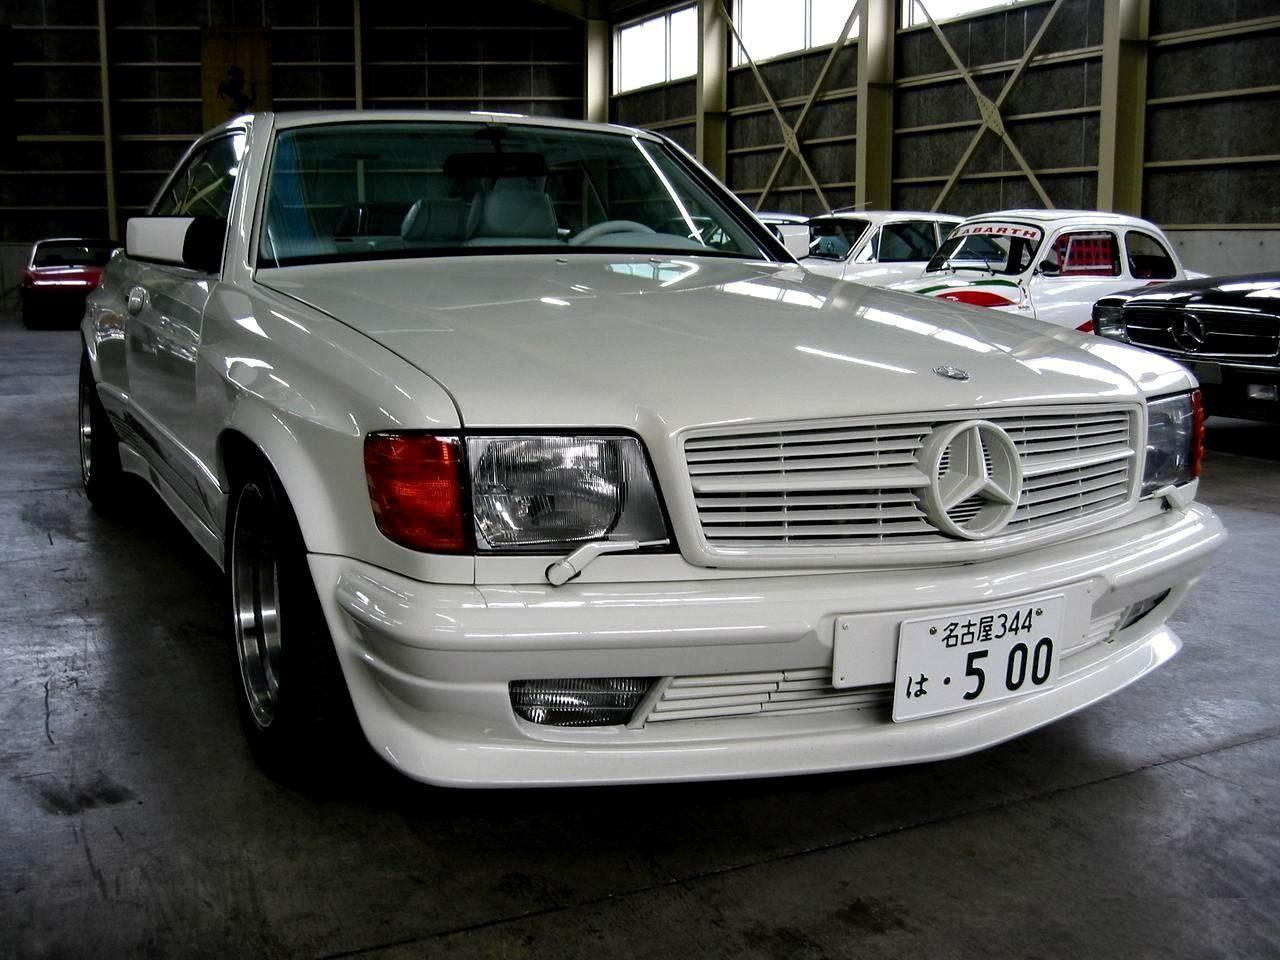 How many amg 6 0 4v w126 sec and sel cars were built amg side shot - Mercedes Benz W126 560 Sec Amg 6 0 Dohc